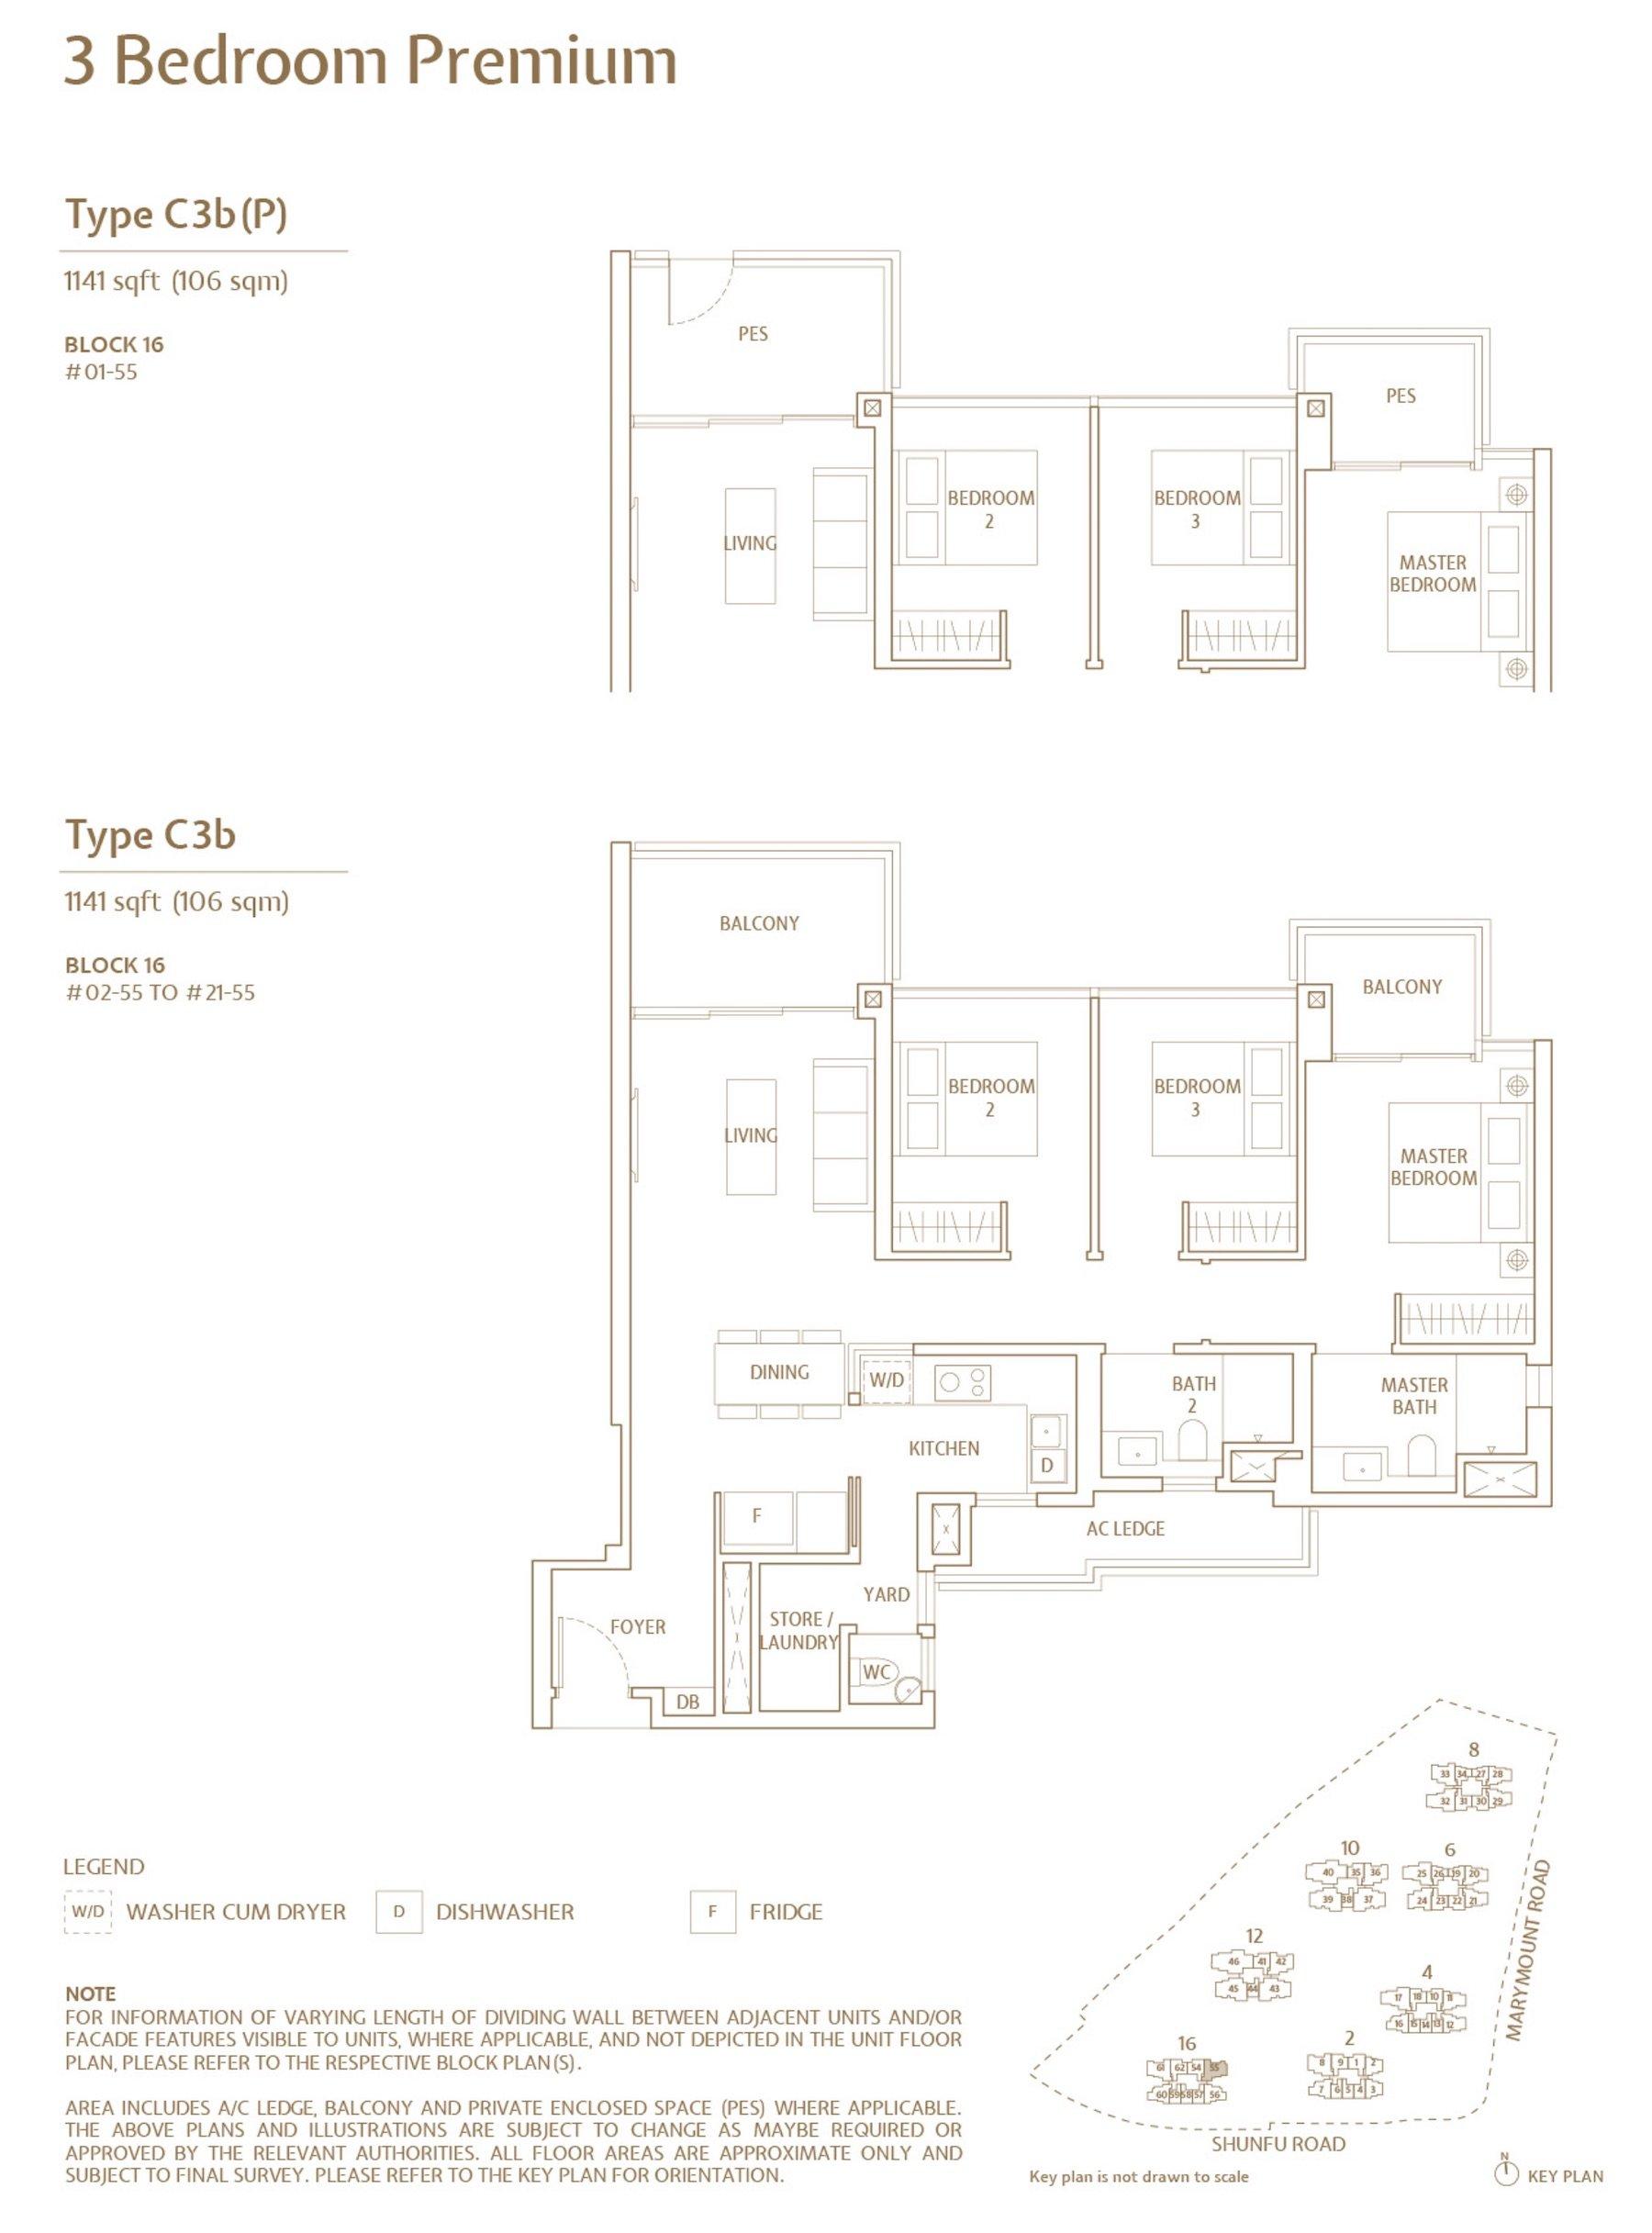 Jadescape 顺福轩 condo 3 bedroom type C3b